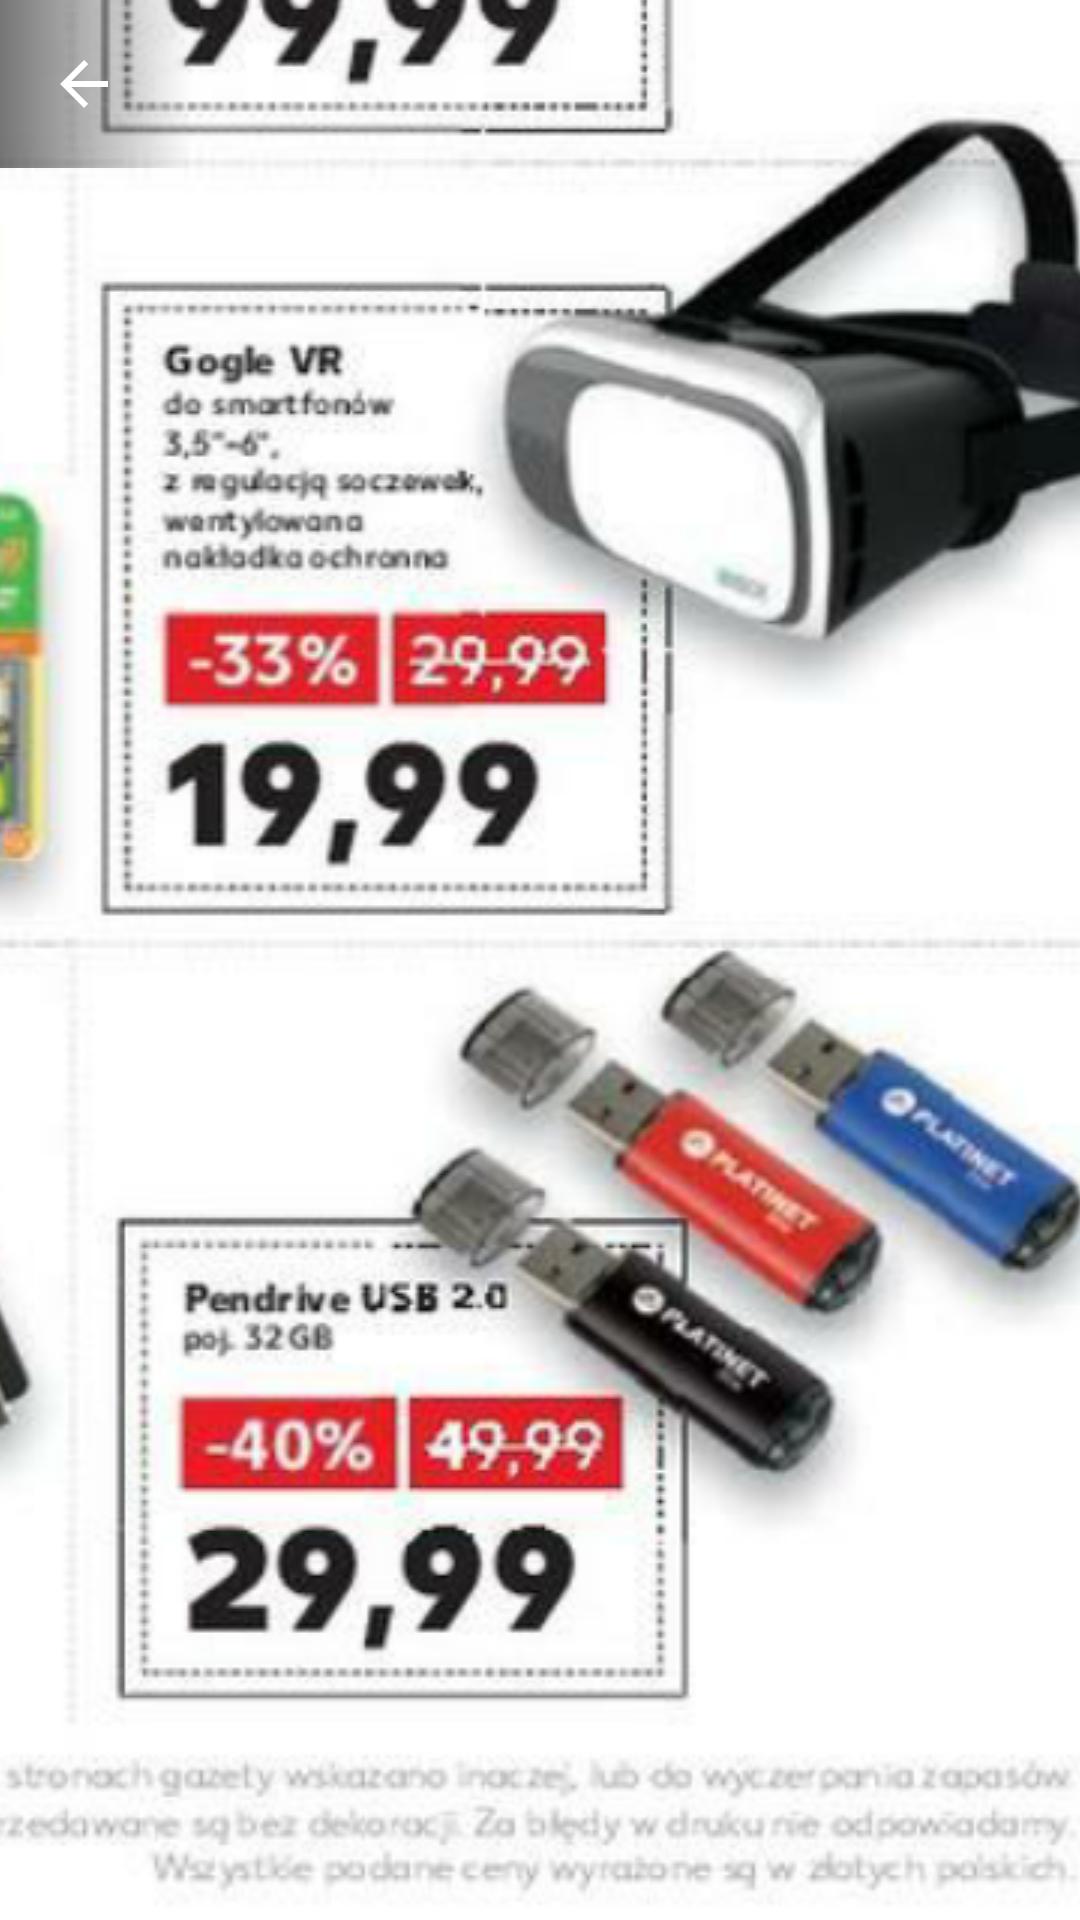 Pendrive Platinet 32 GB, USB2.0, Kaufland